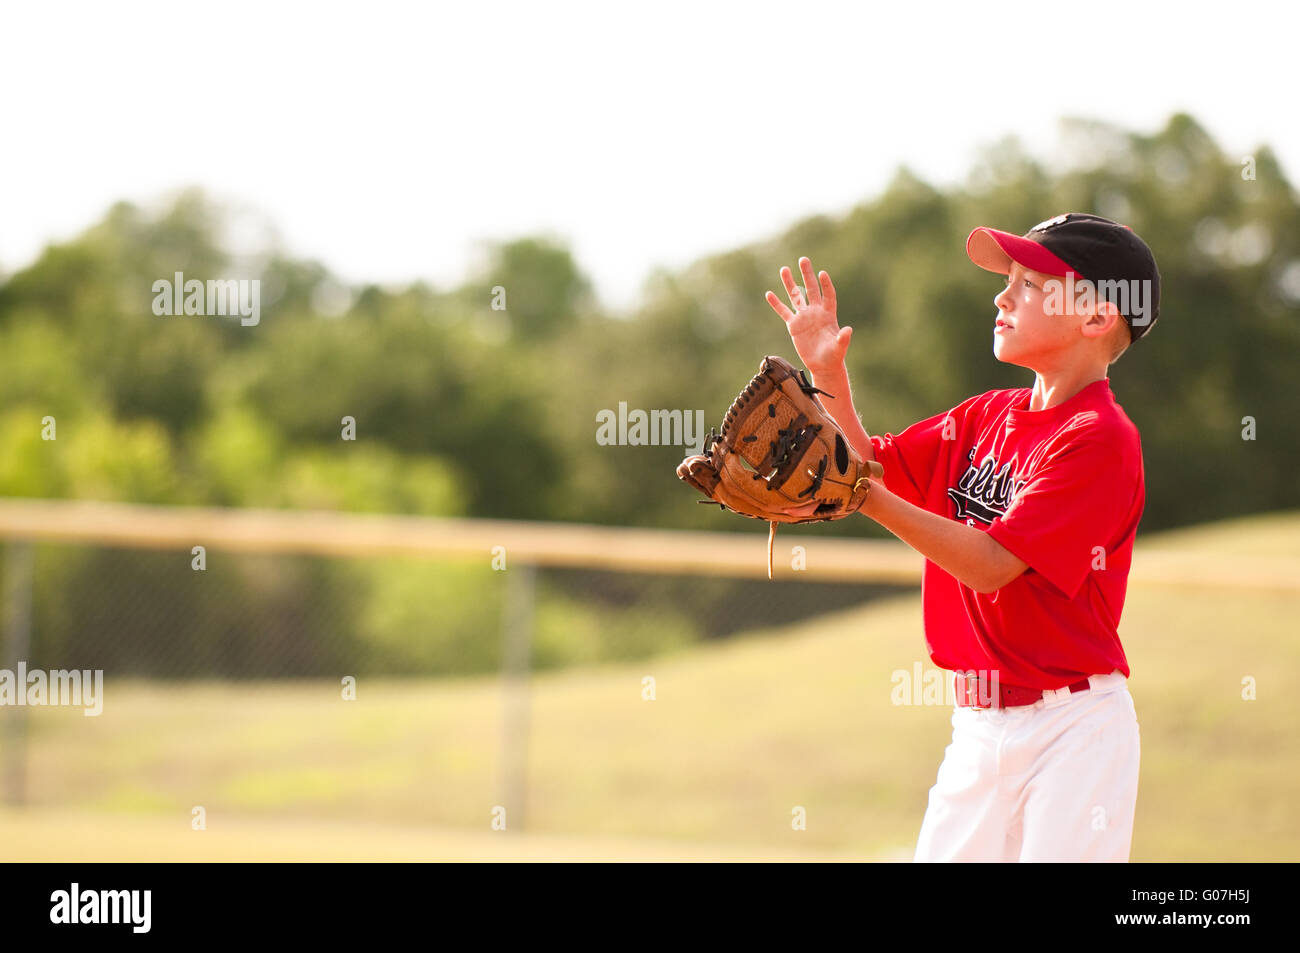 American Baseball Cap Stockfotos & American Baseball Cap Bilder ...